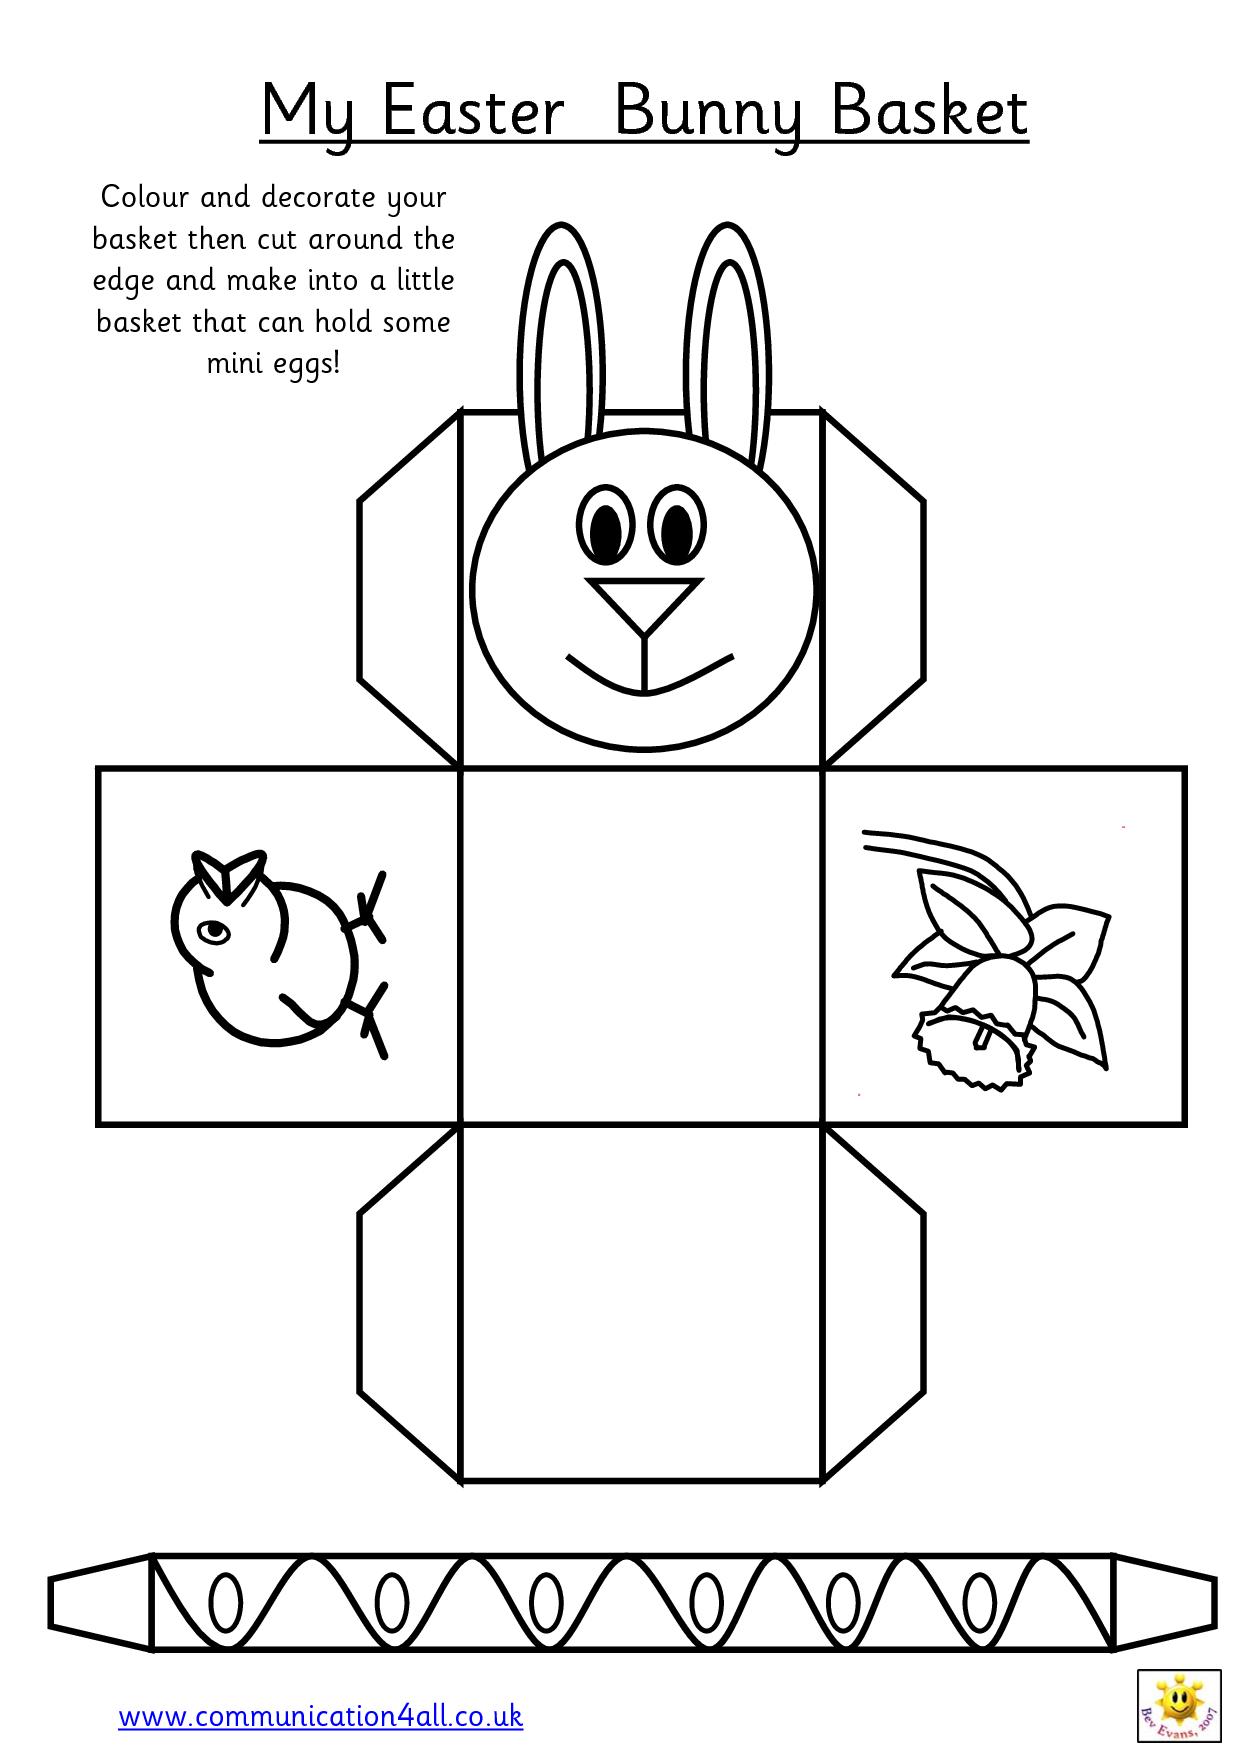 Pin By Joyce Enos On Crafts Easter Basket Template Printable Easter Activities Easter Basket Printable